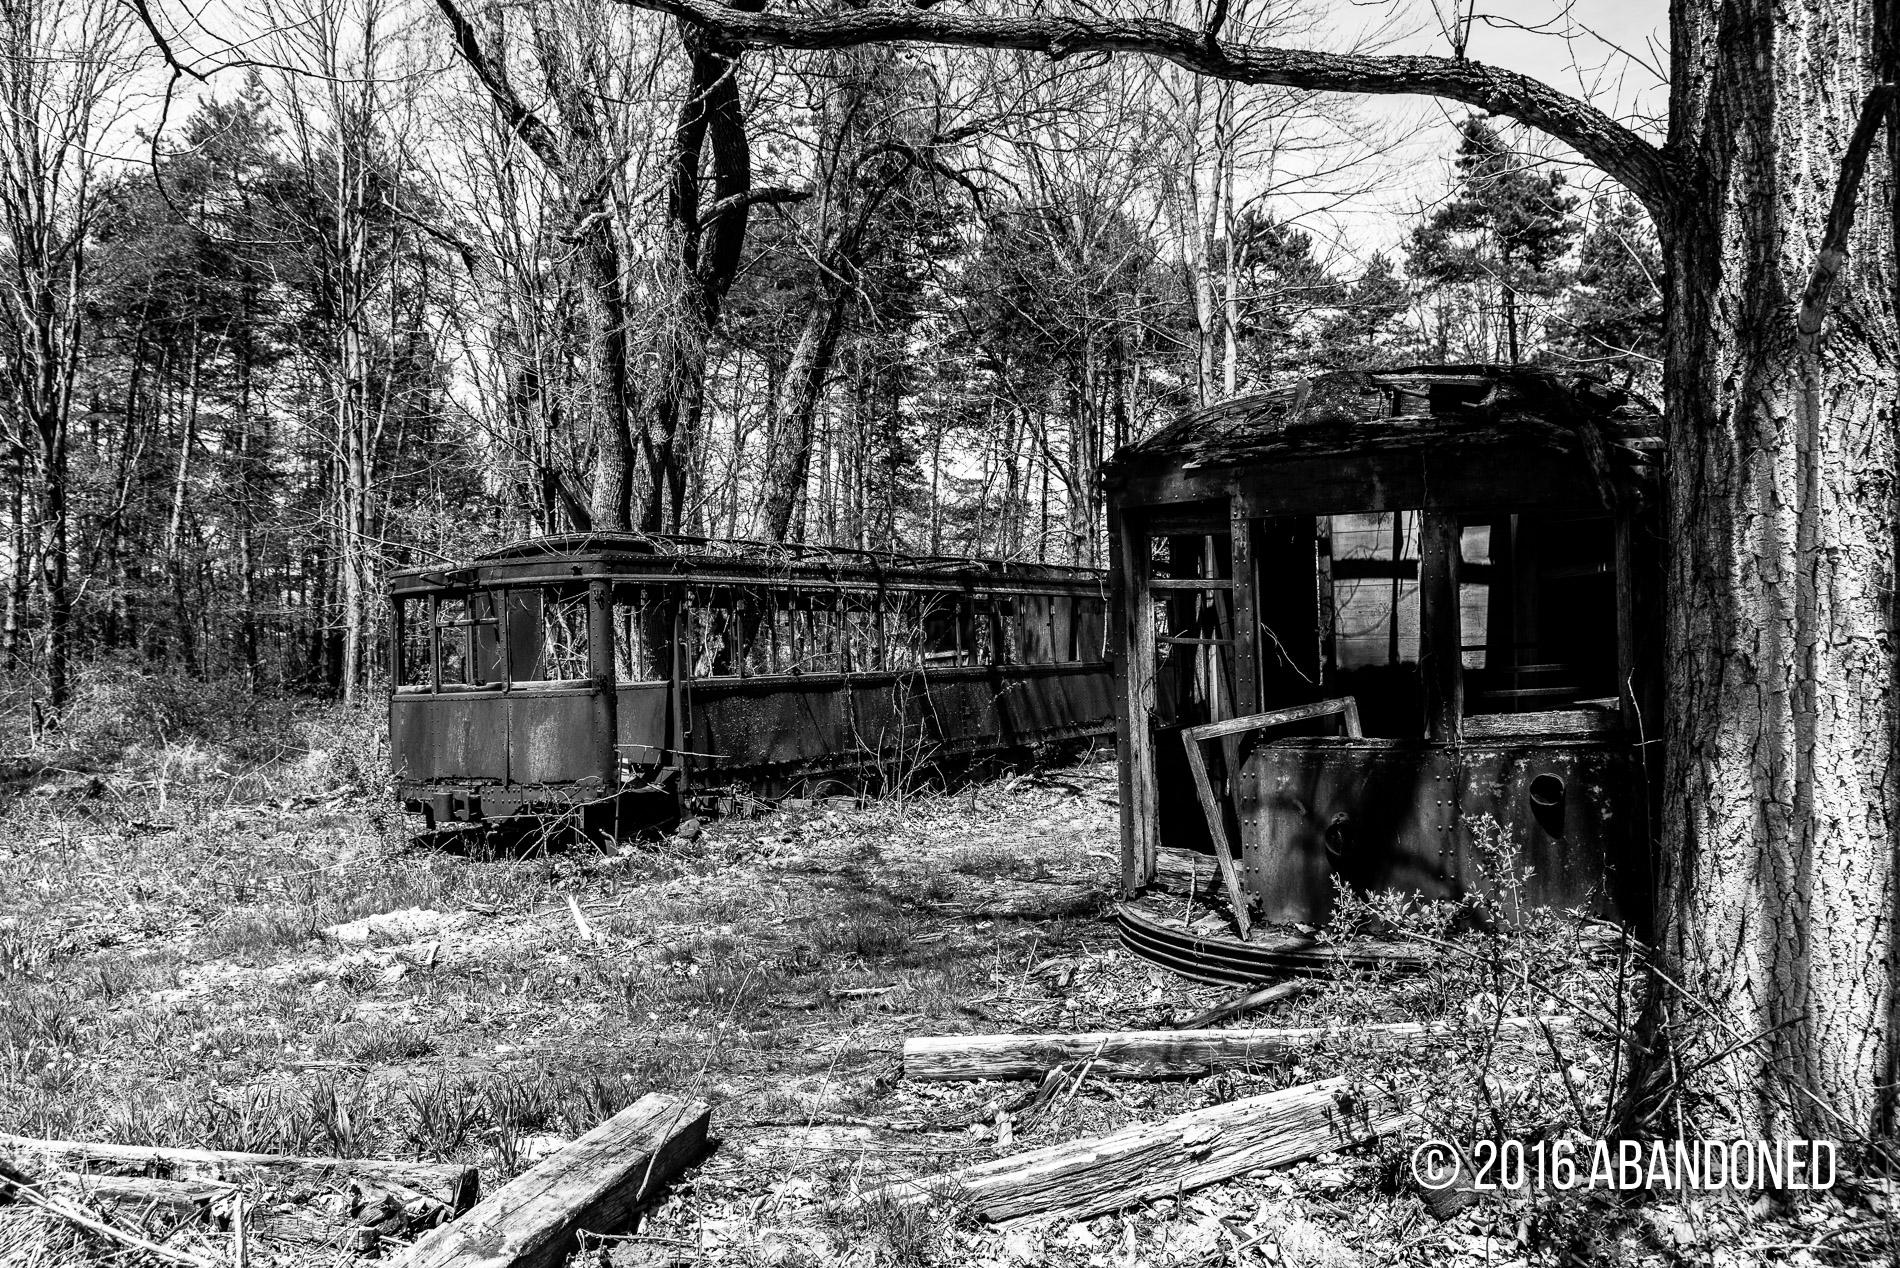 Lake Shore Electric Railway Cars Abandoned By Sherman Cahal